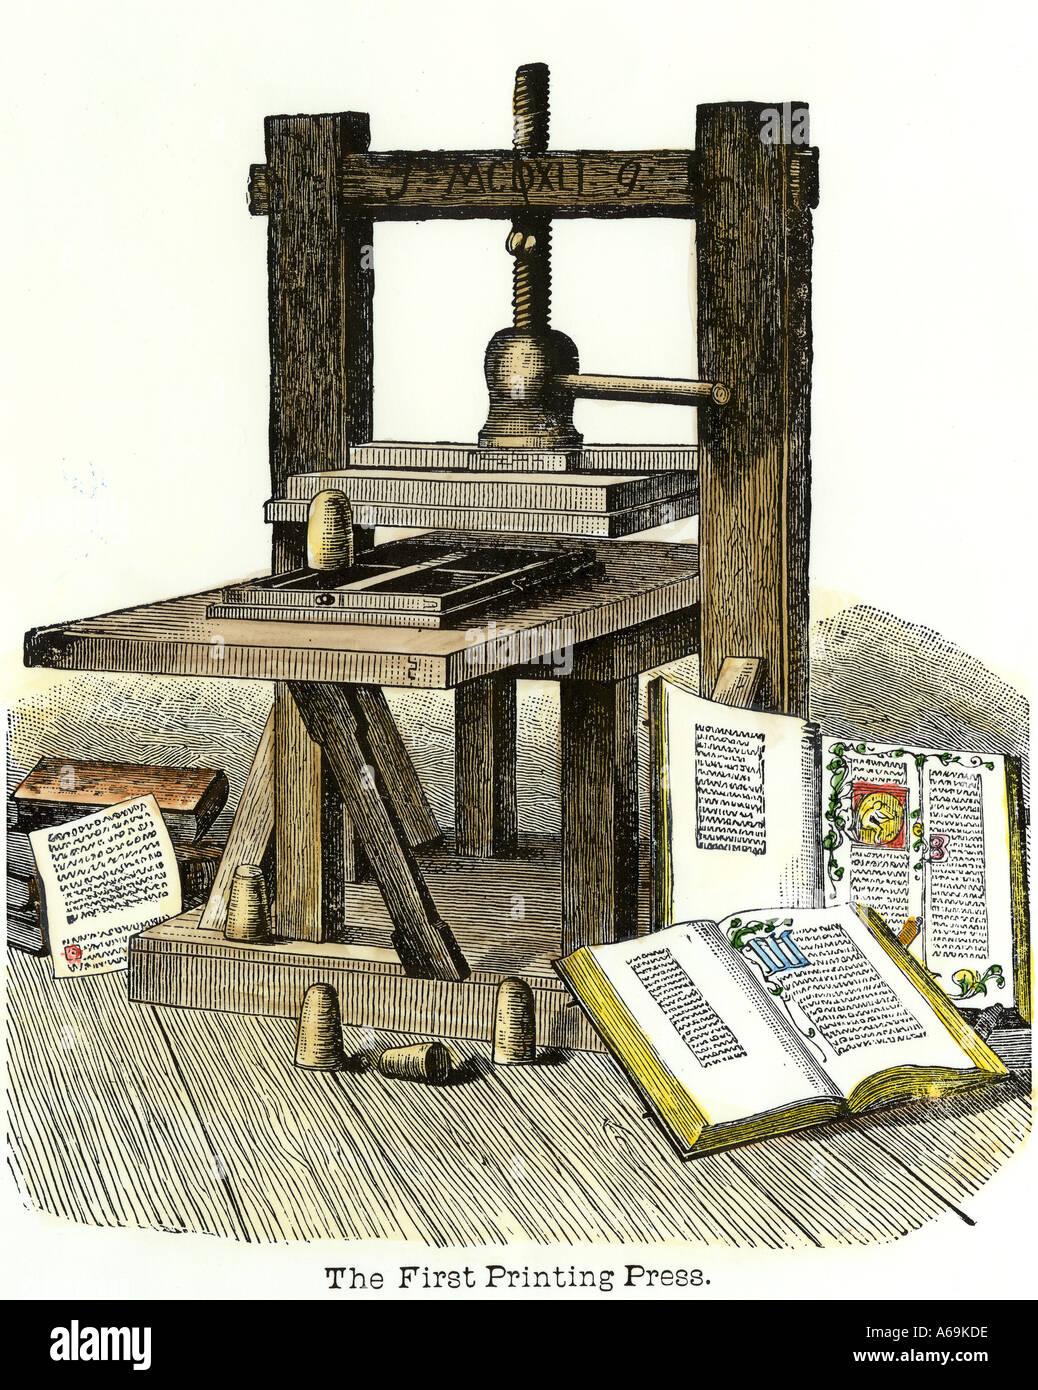 Johann Gutenberg s printing press Mainz Germany 1450s. Hand-colored woodcut - Stock Image